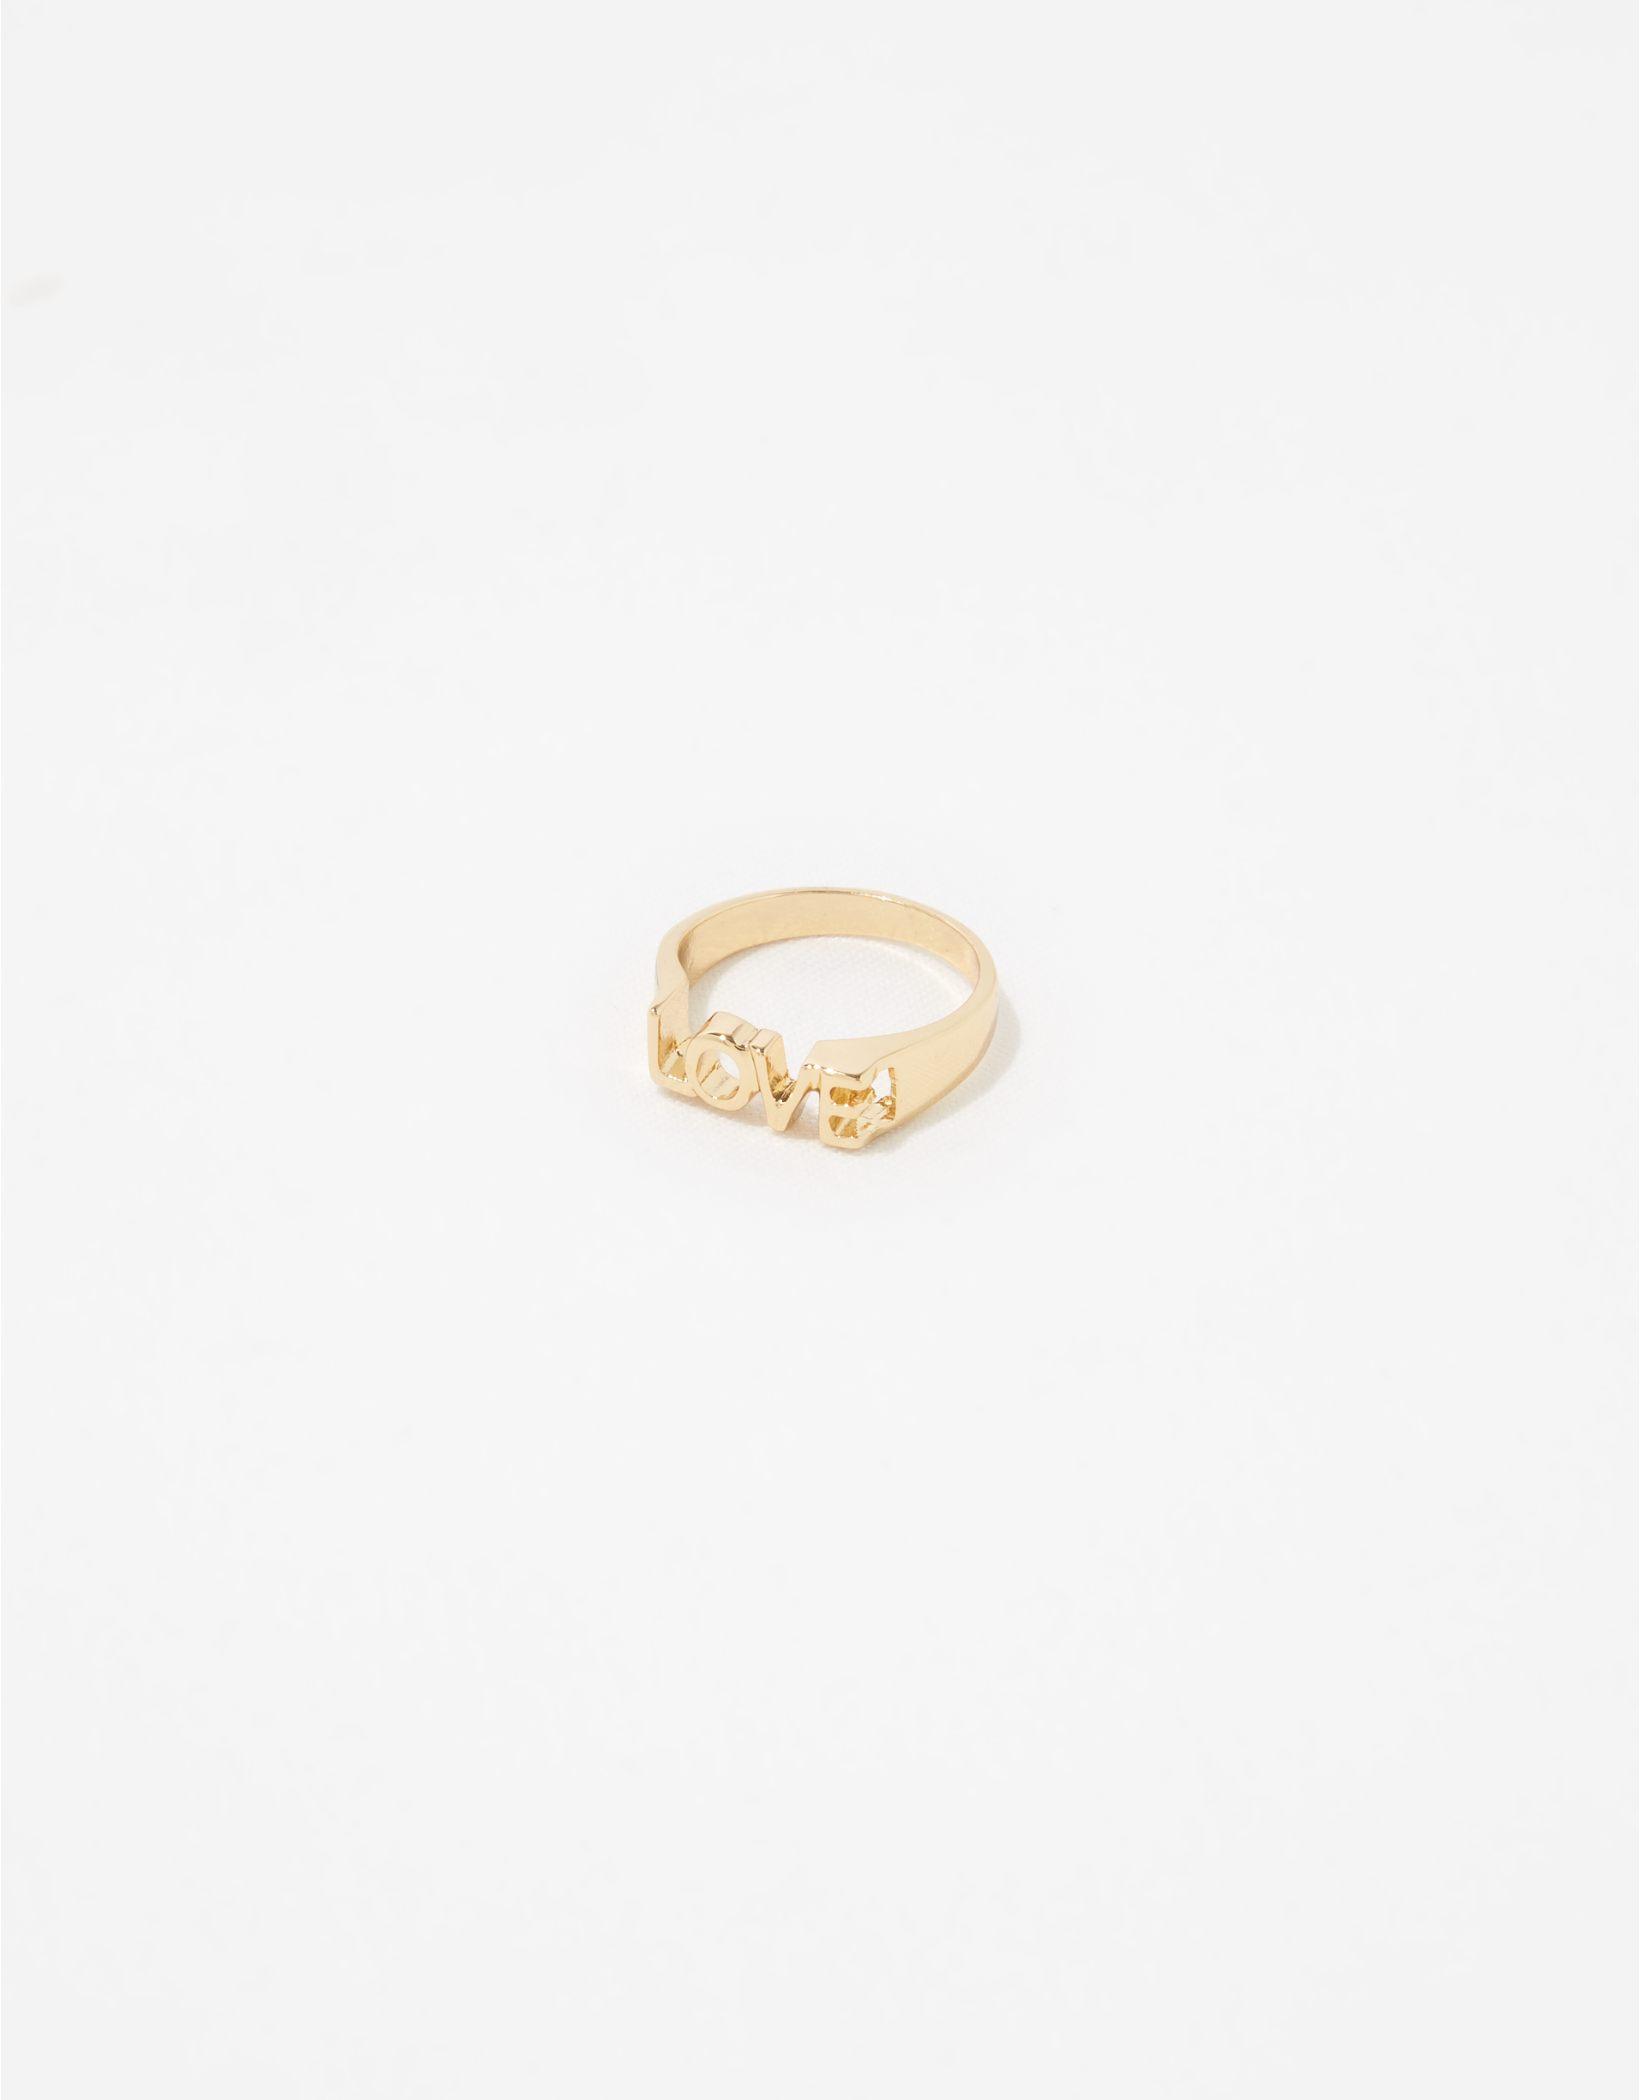 Aerie Love Ring